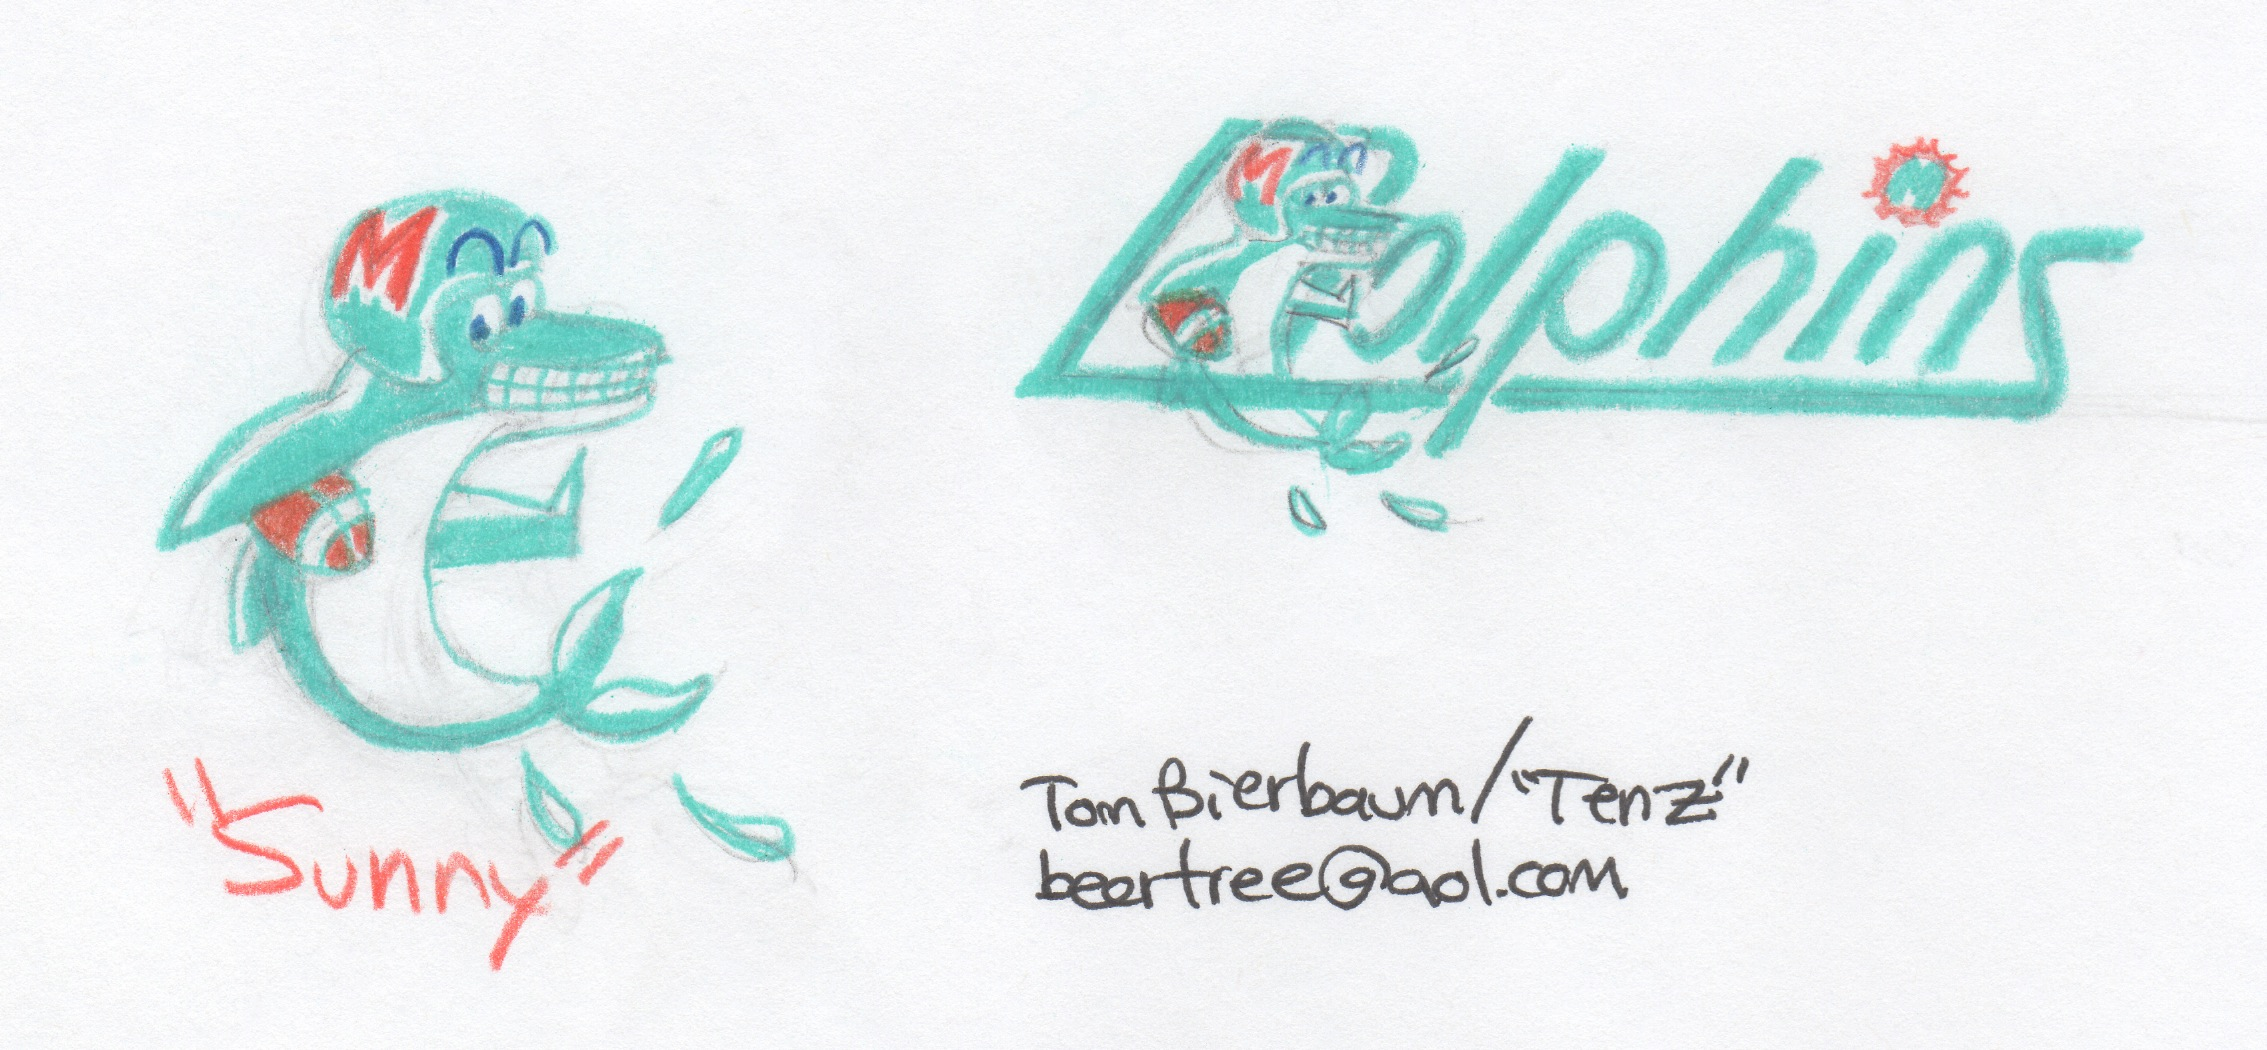 tom bierbaum dolphins logo